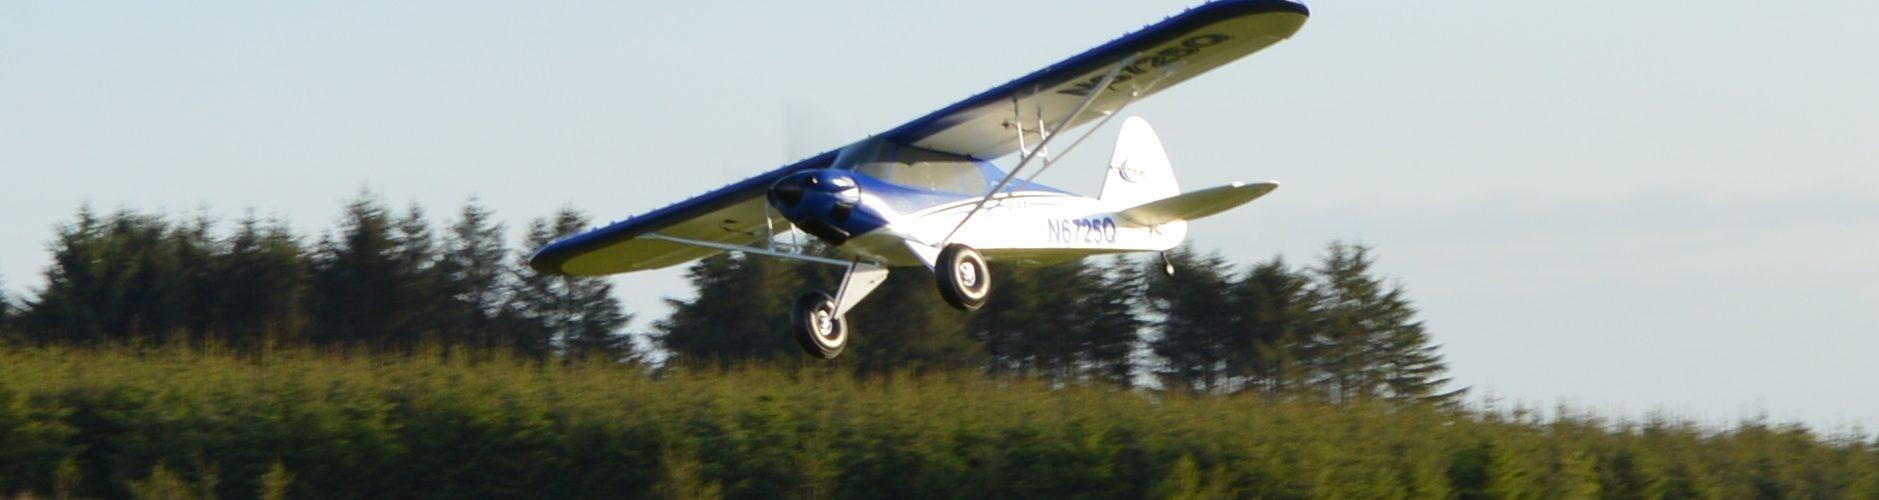 Caplaw Model Flying Group